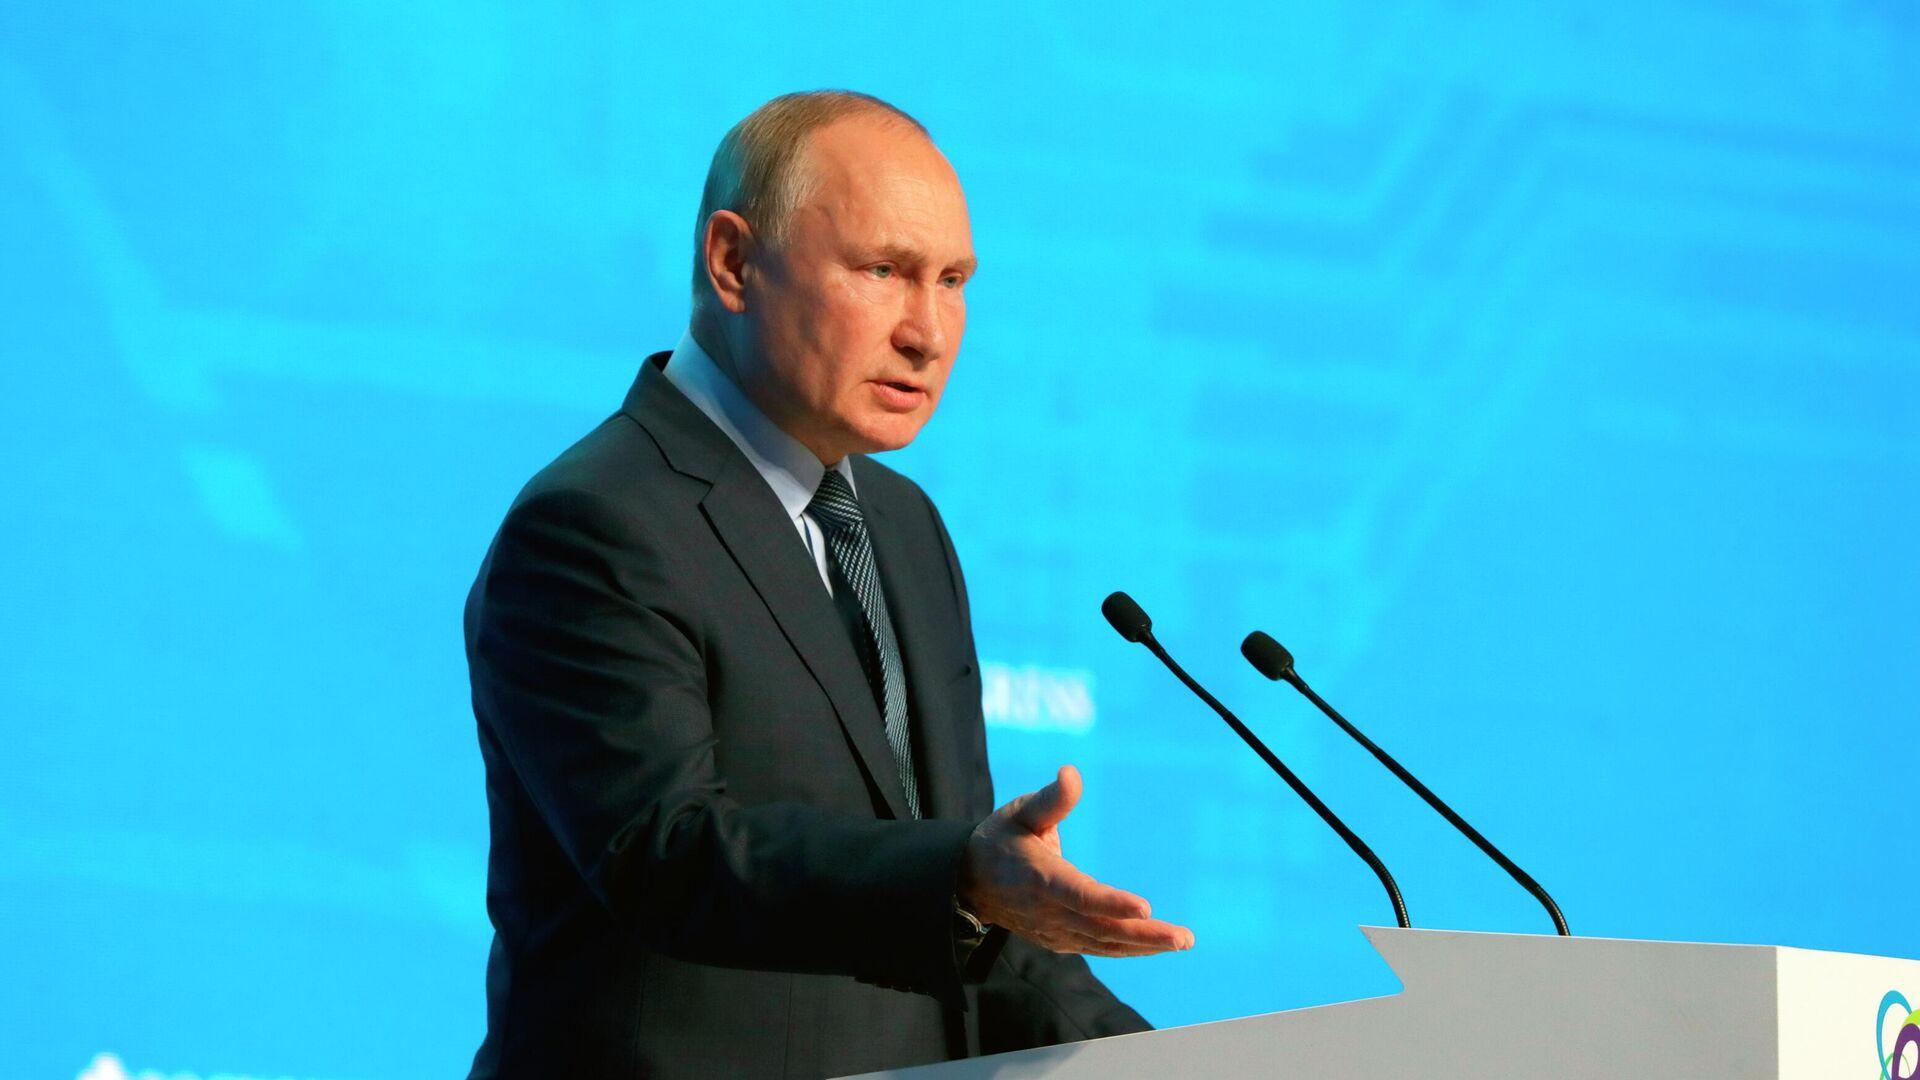 Слова Путина о США показались американцам насмешкой